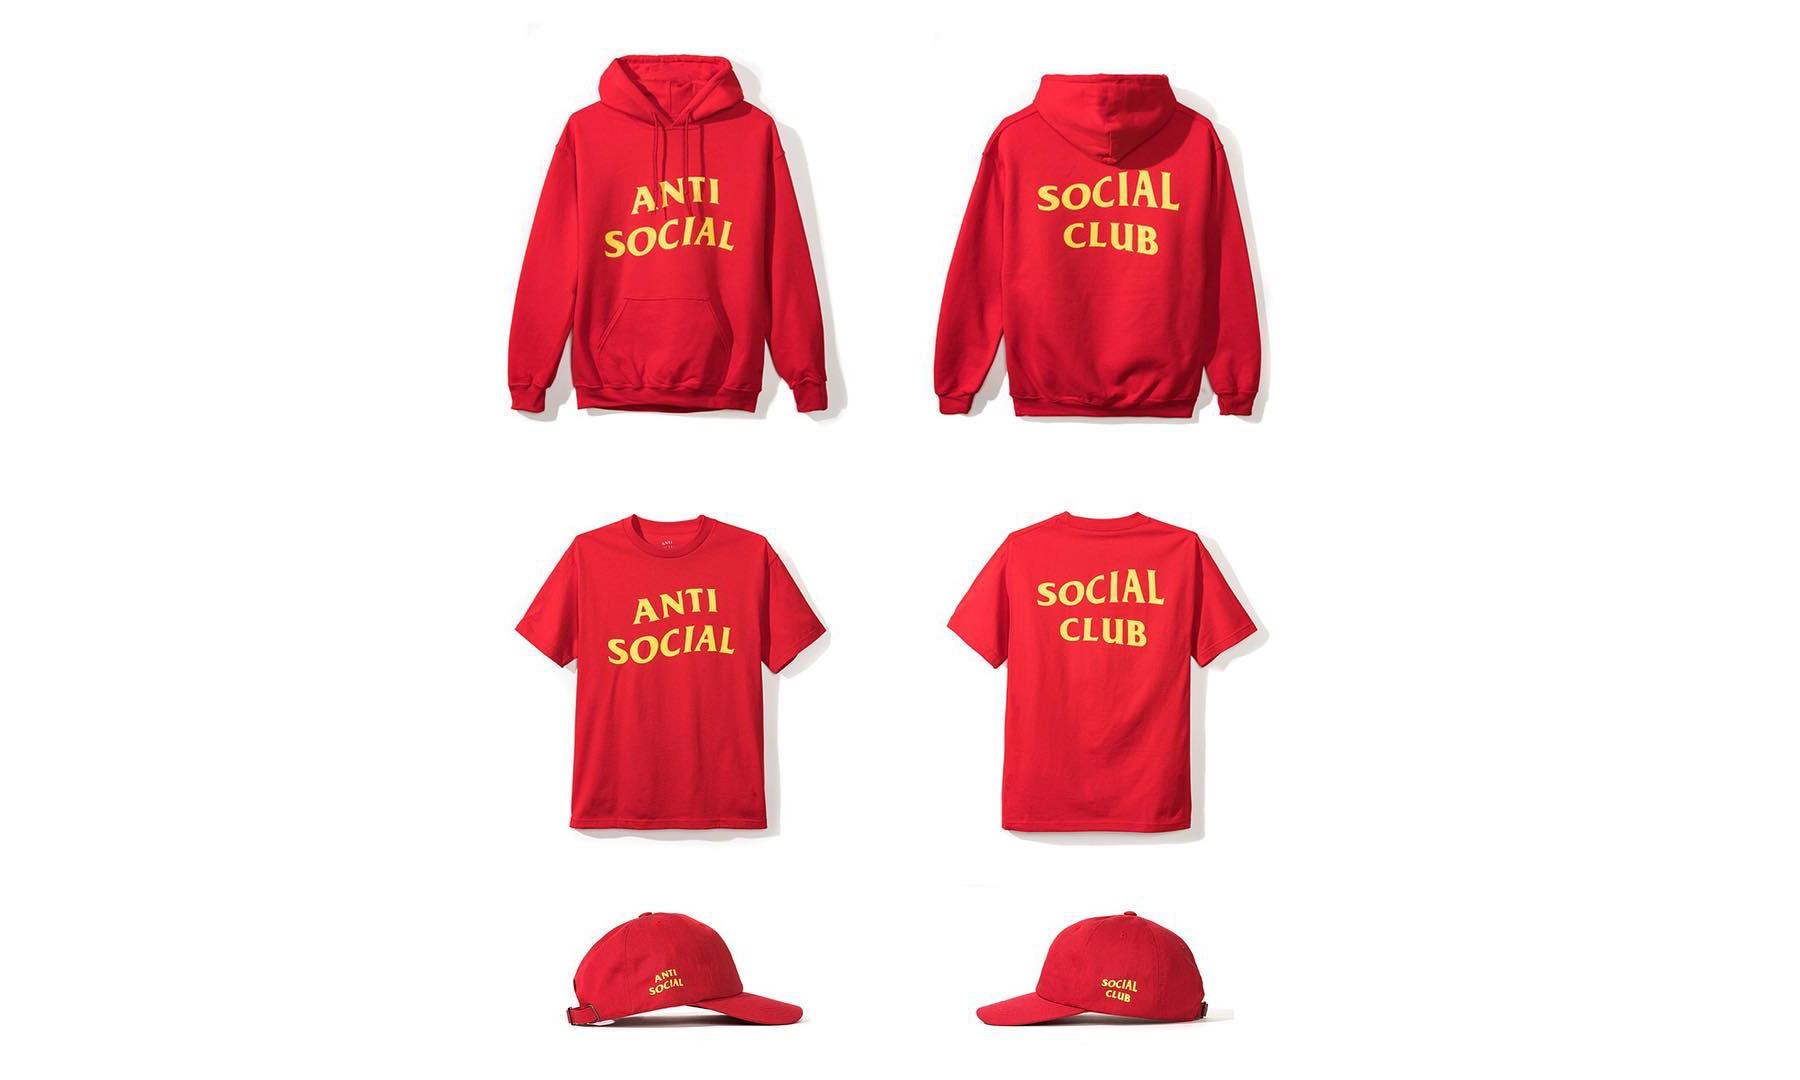 Anti Social Social Club 亚洲限定系列即将开售